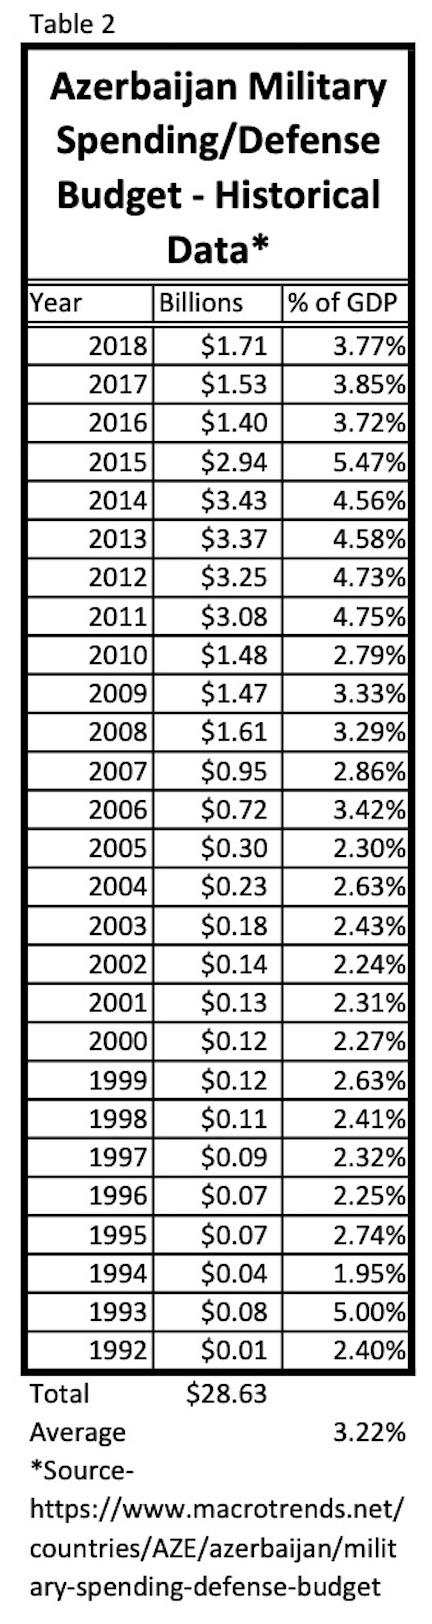 Azerbaijan's defense budget since 1992